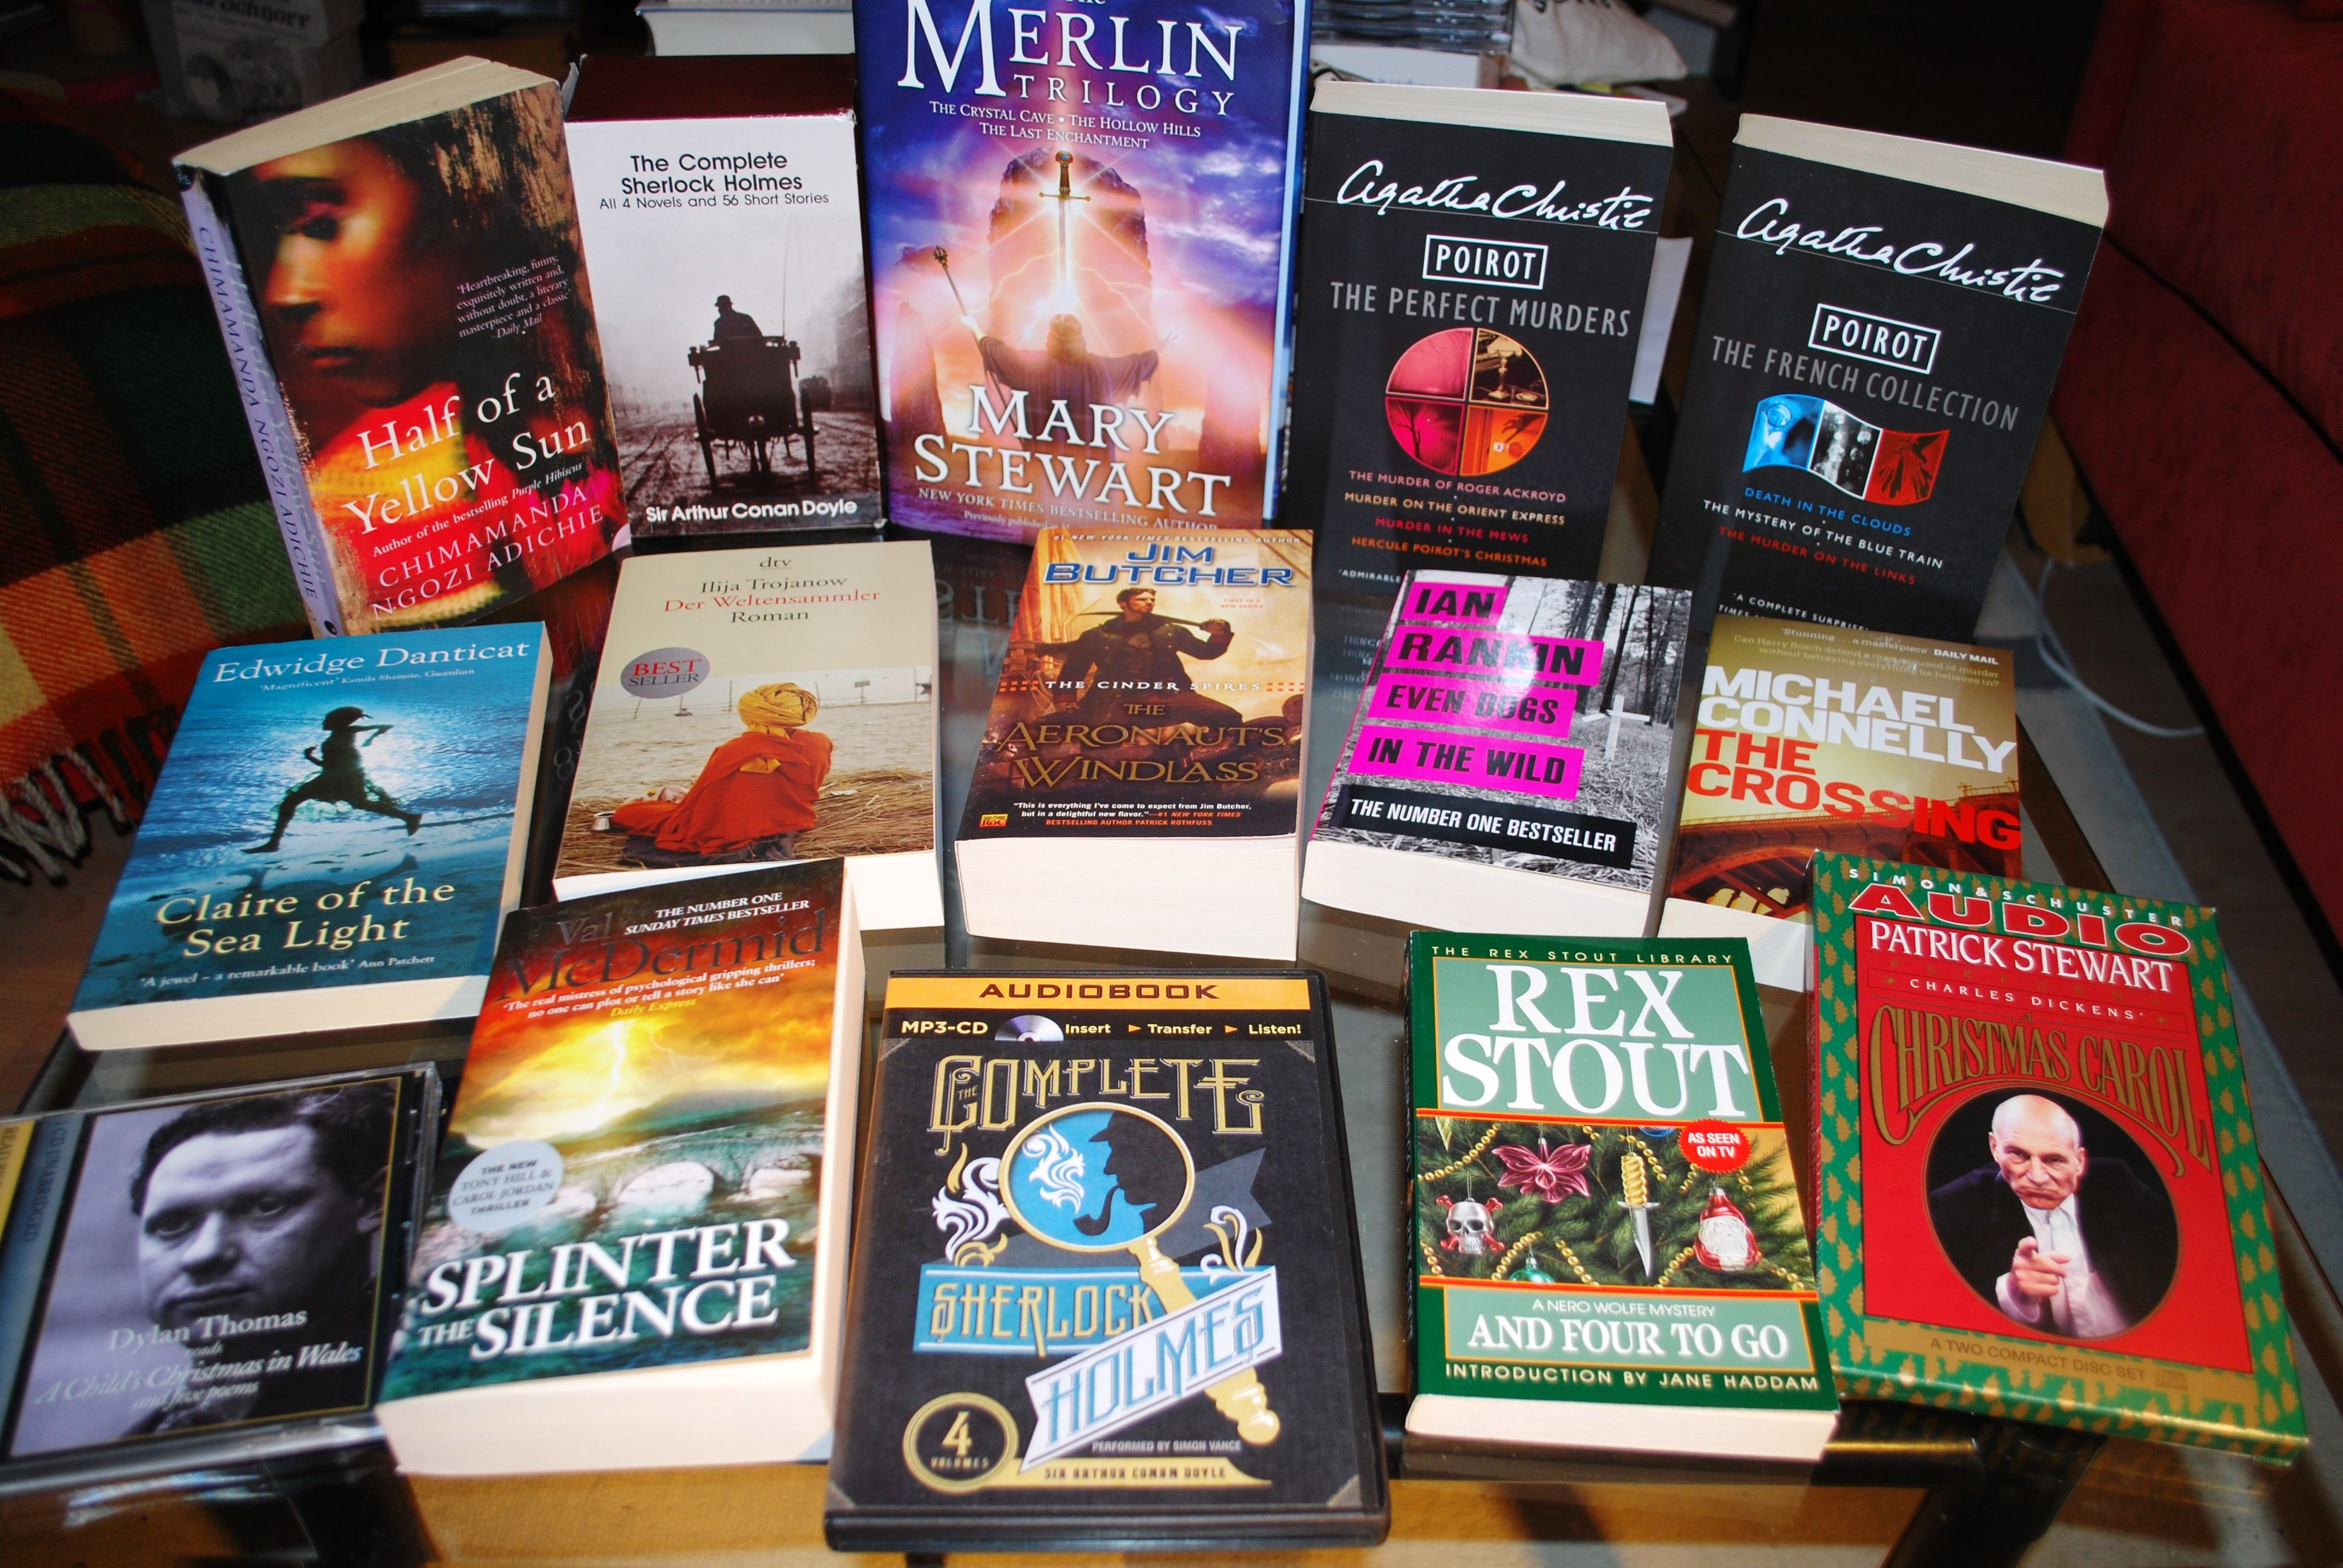 The Twelve Tasks of the Festive Season books